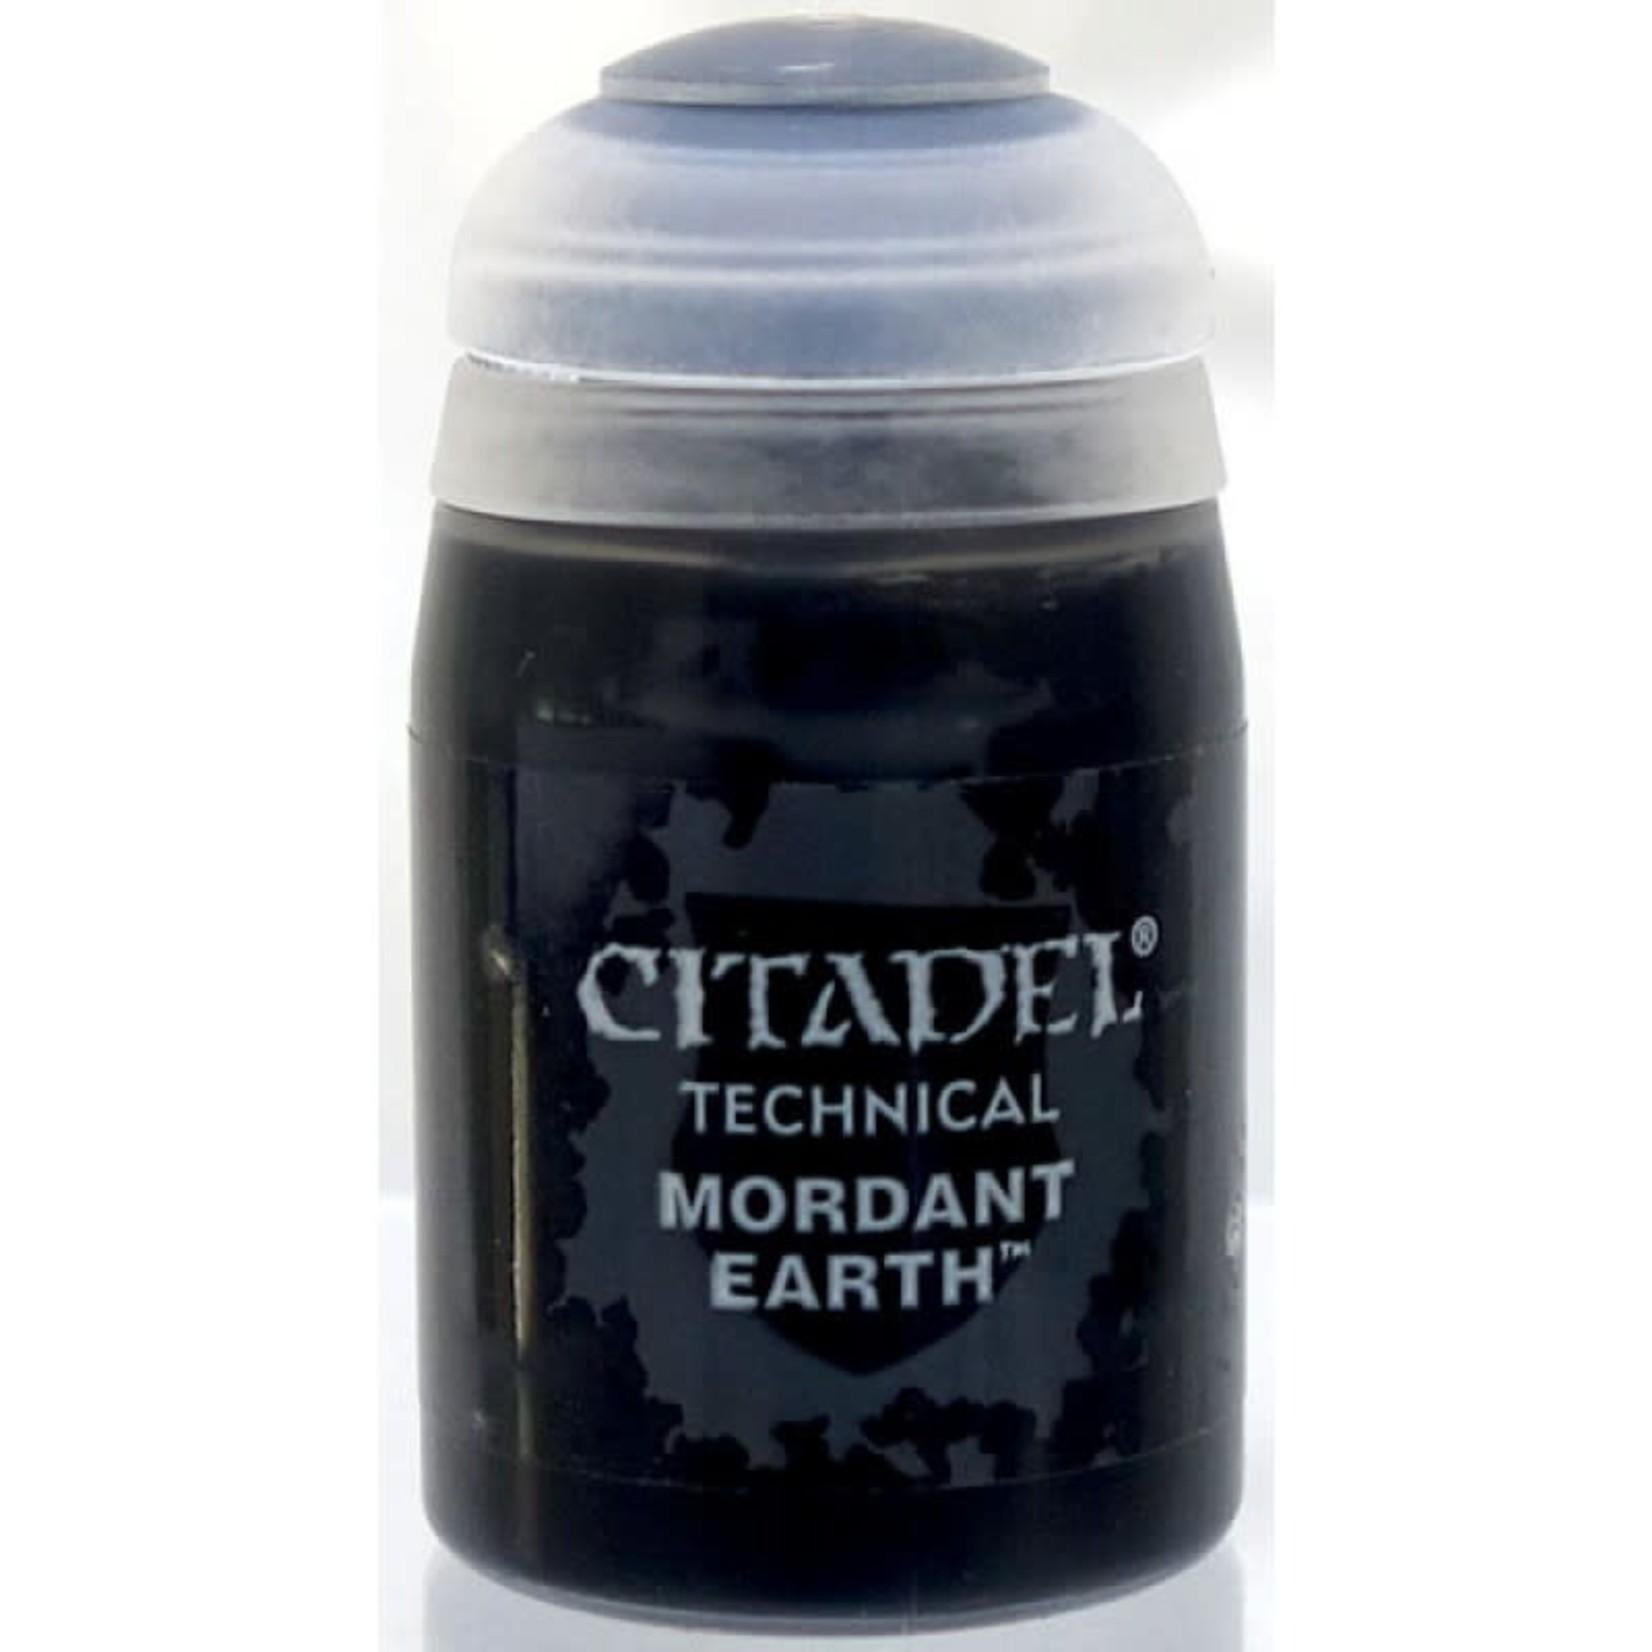 Citadel Paint: Mordant Earth Technical 24 ml